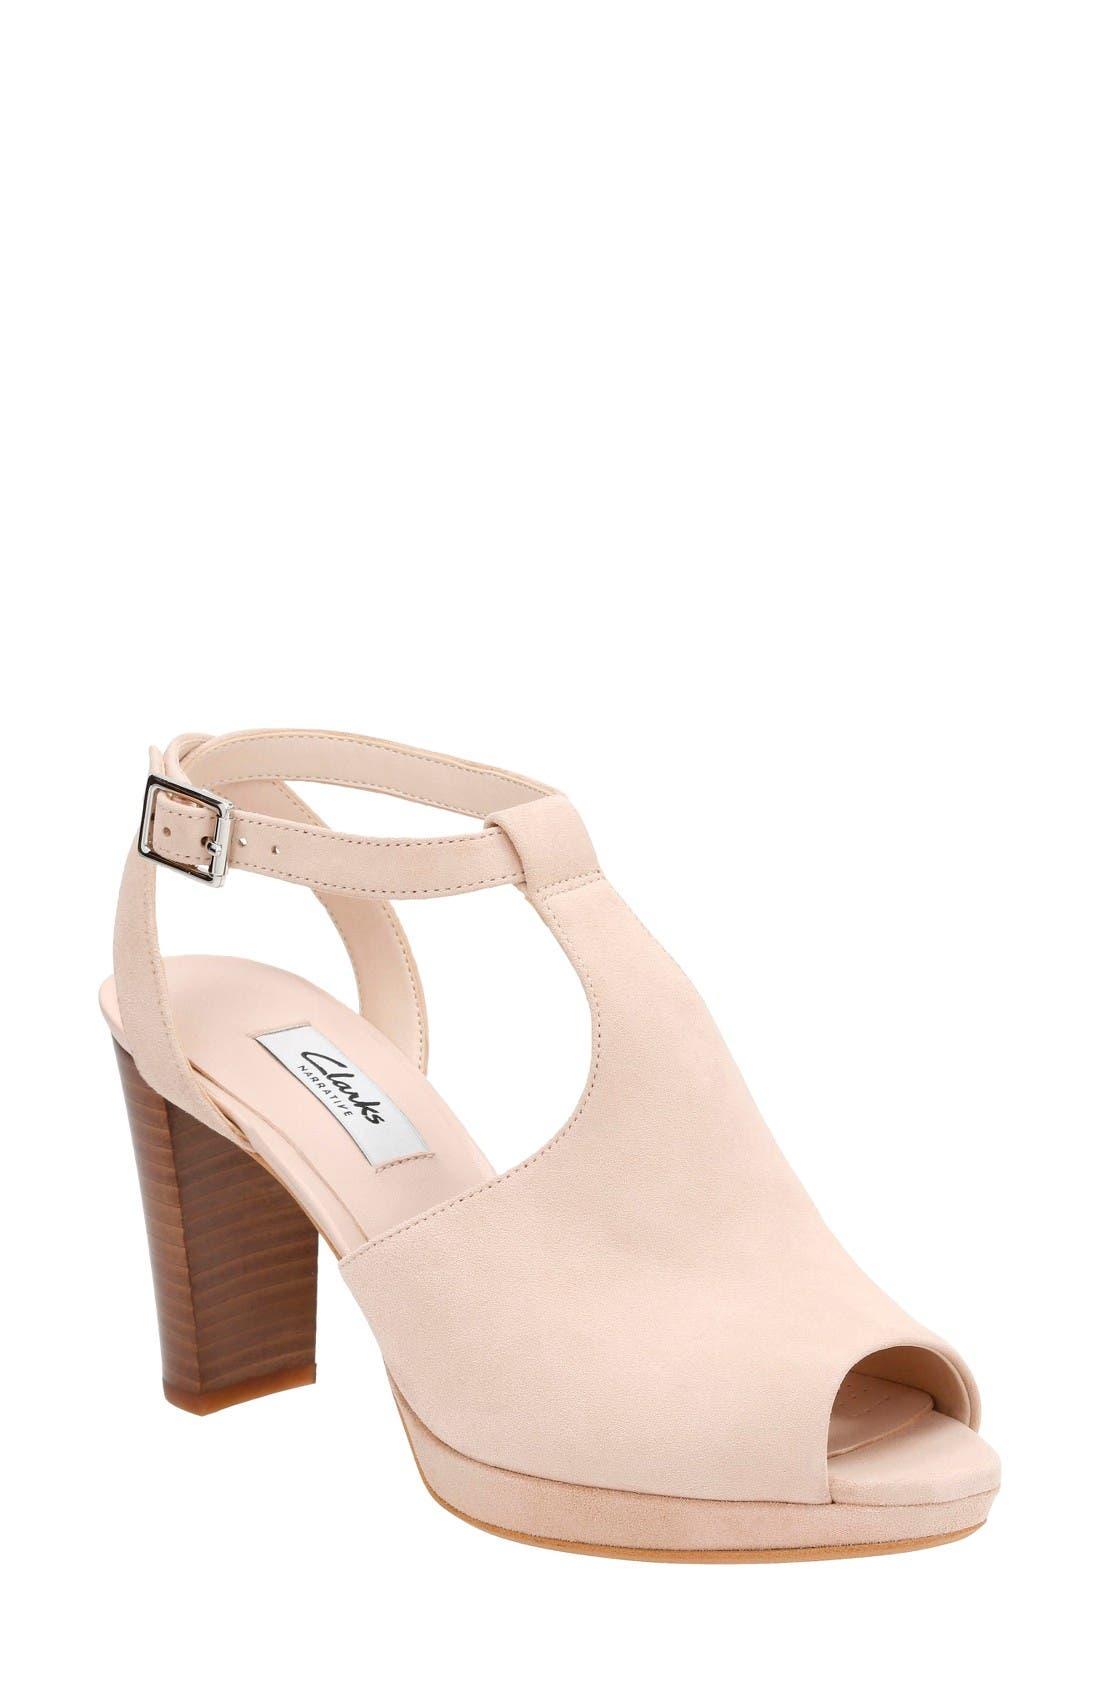 CLARKS® Kendra Charm Sandal